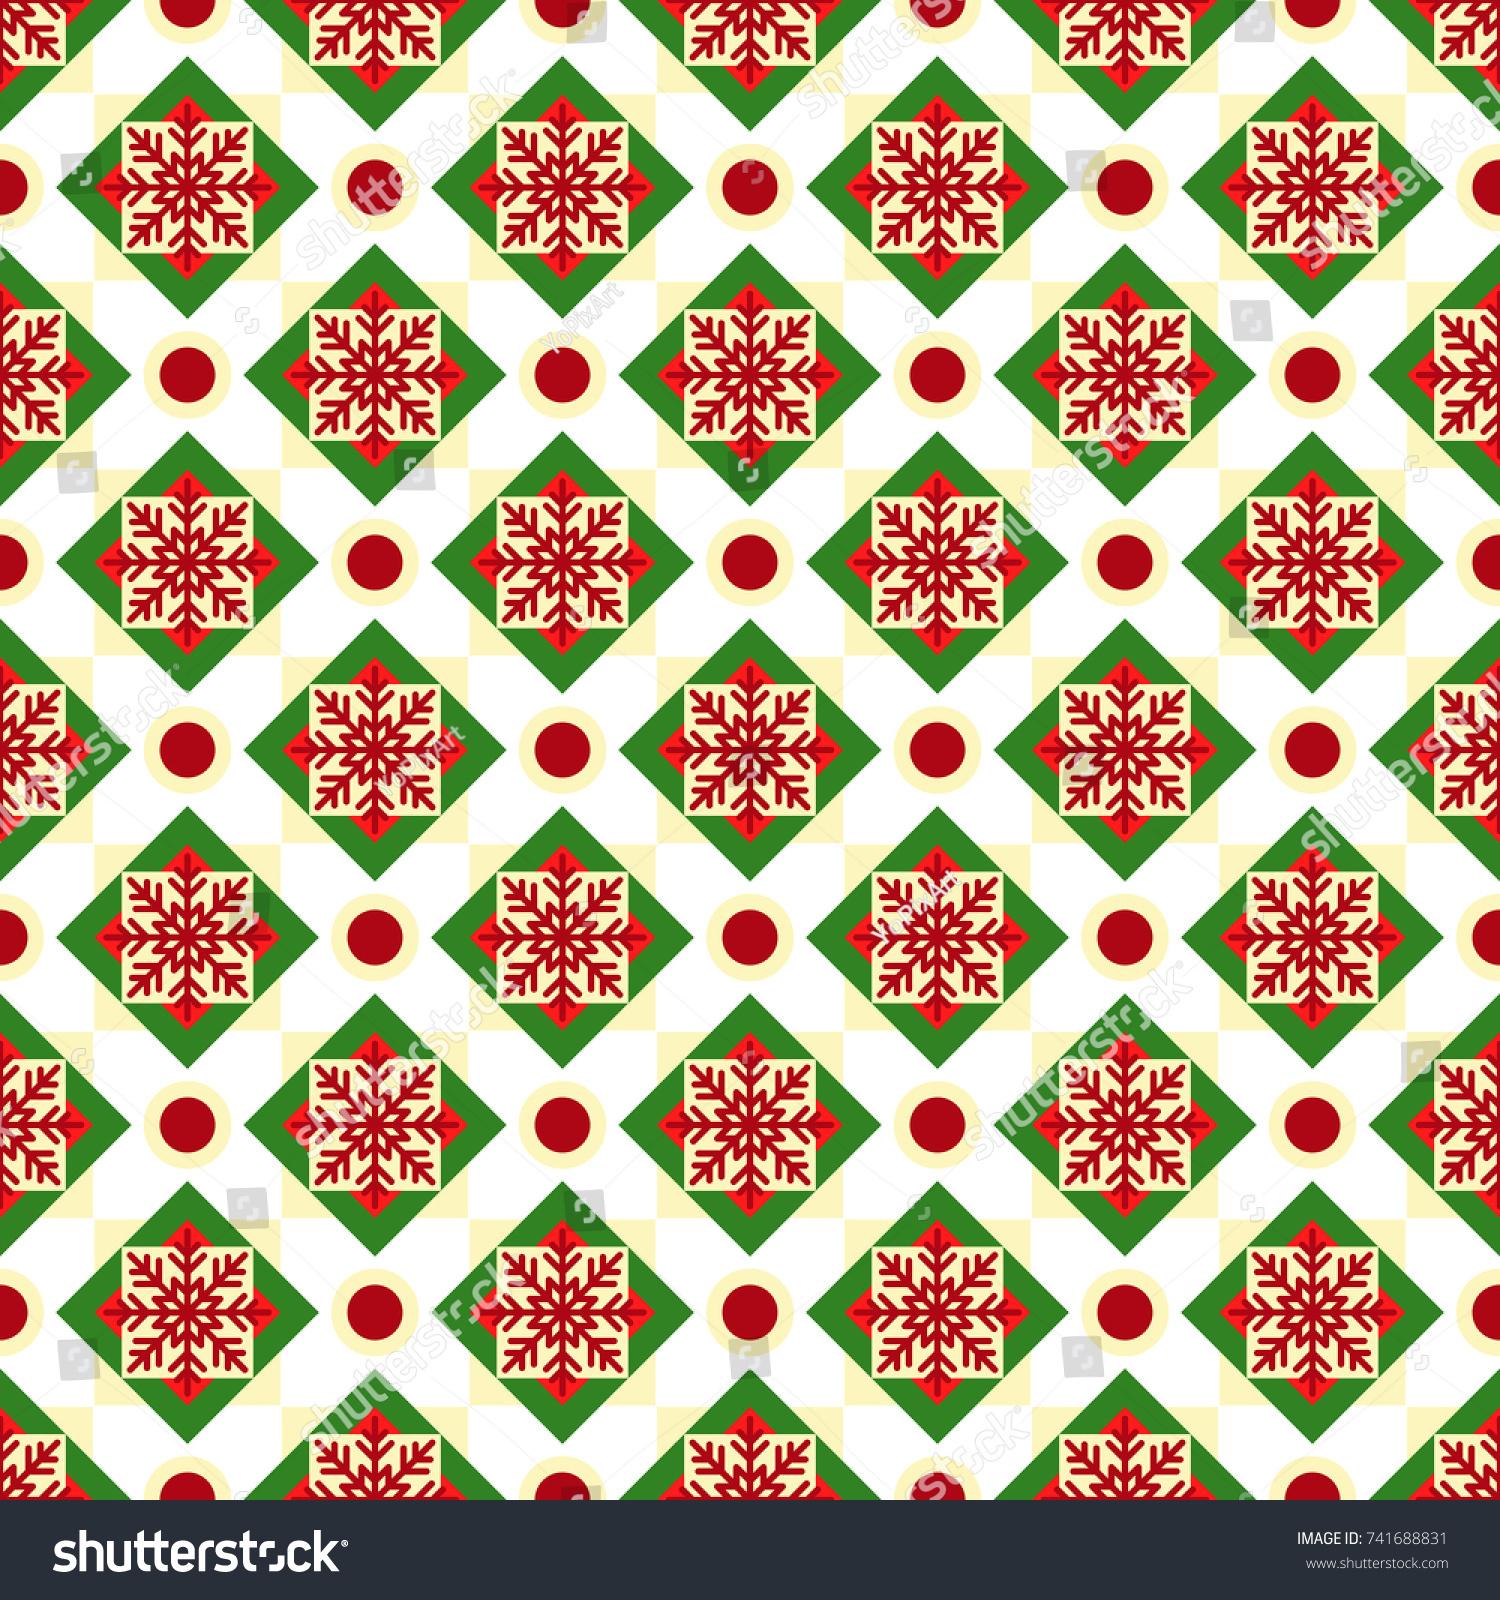 Christmas Geometric Nordic Seamless Vector Pattern Stock Vector ...